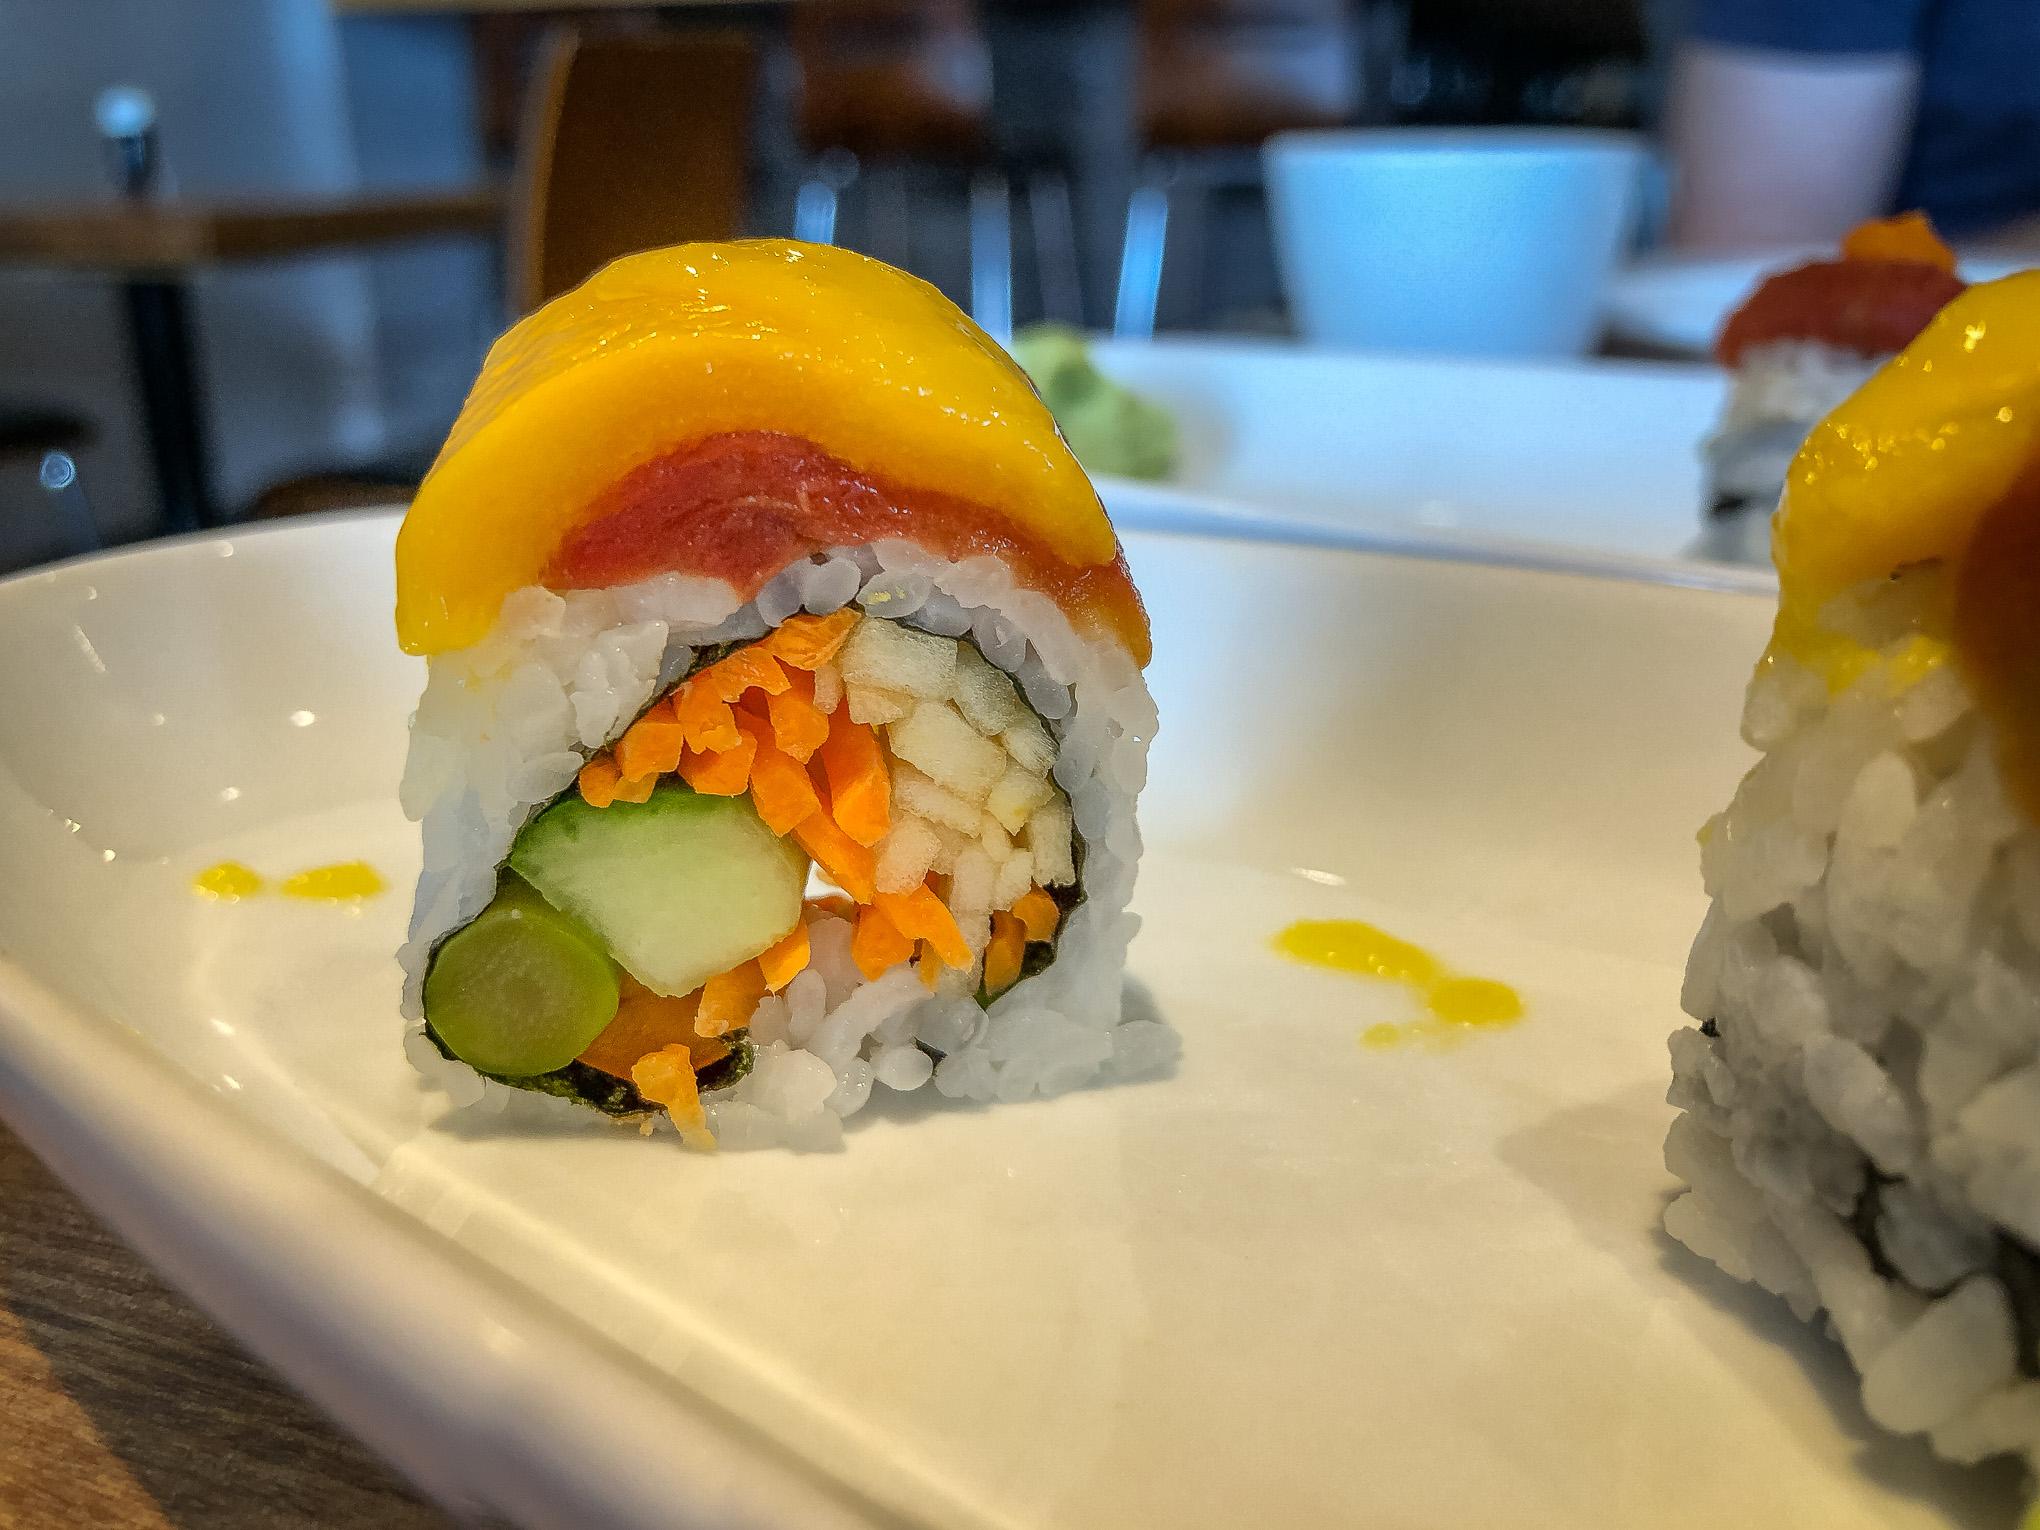 A single sushi roll close up